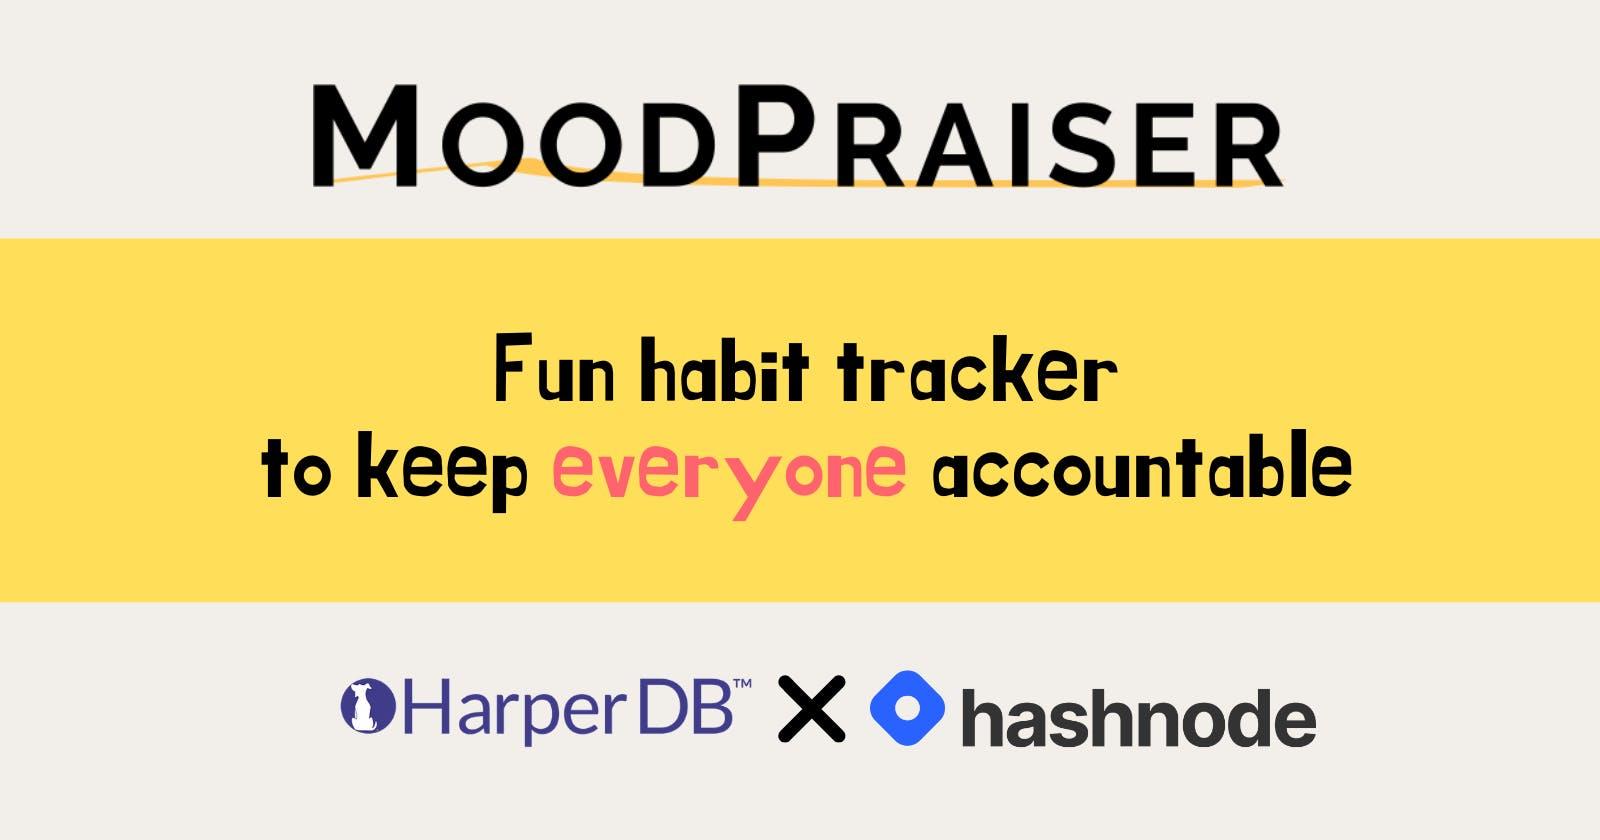 MoodPraiser - Fun habit tracker to keep everyone accountable